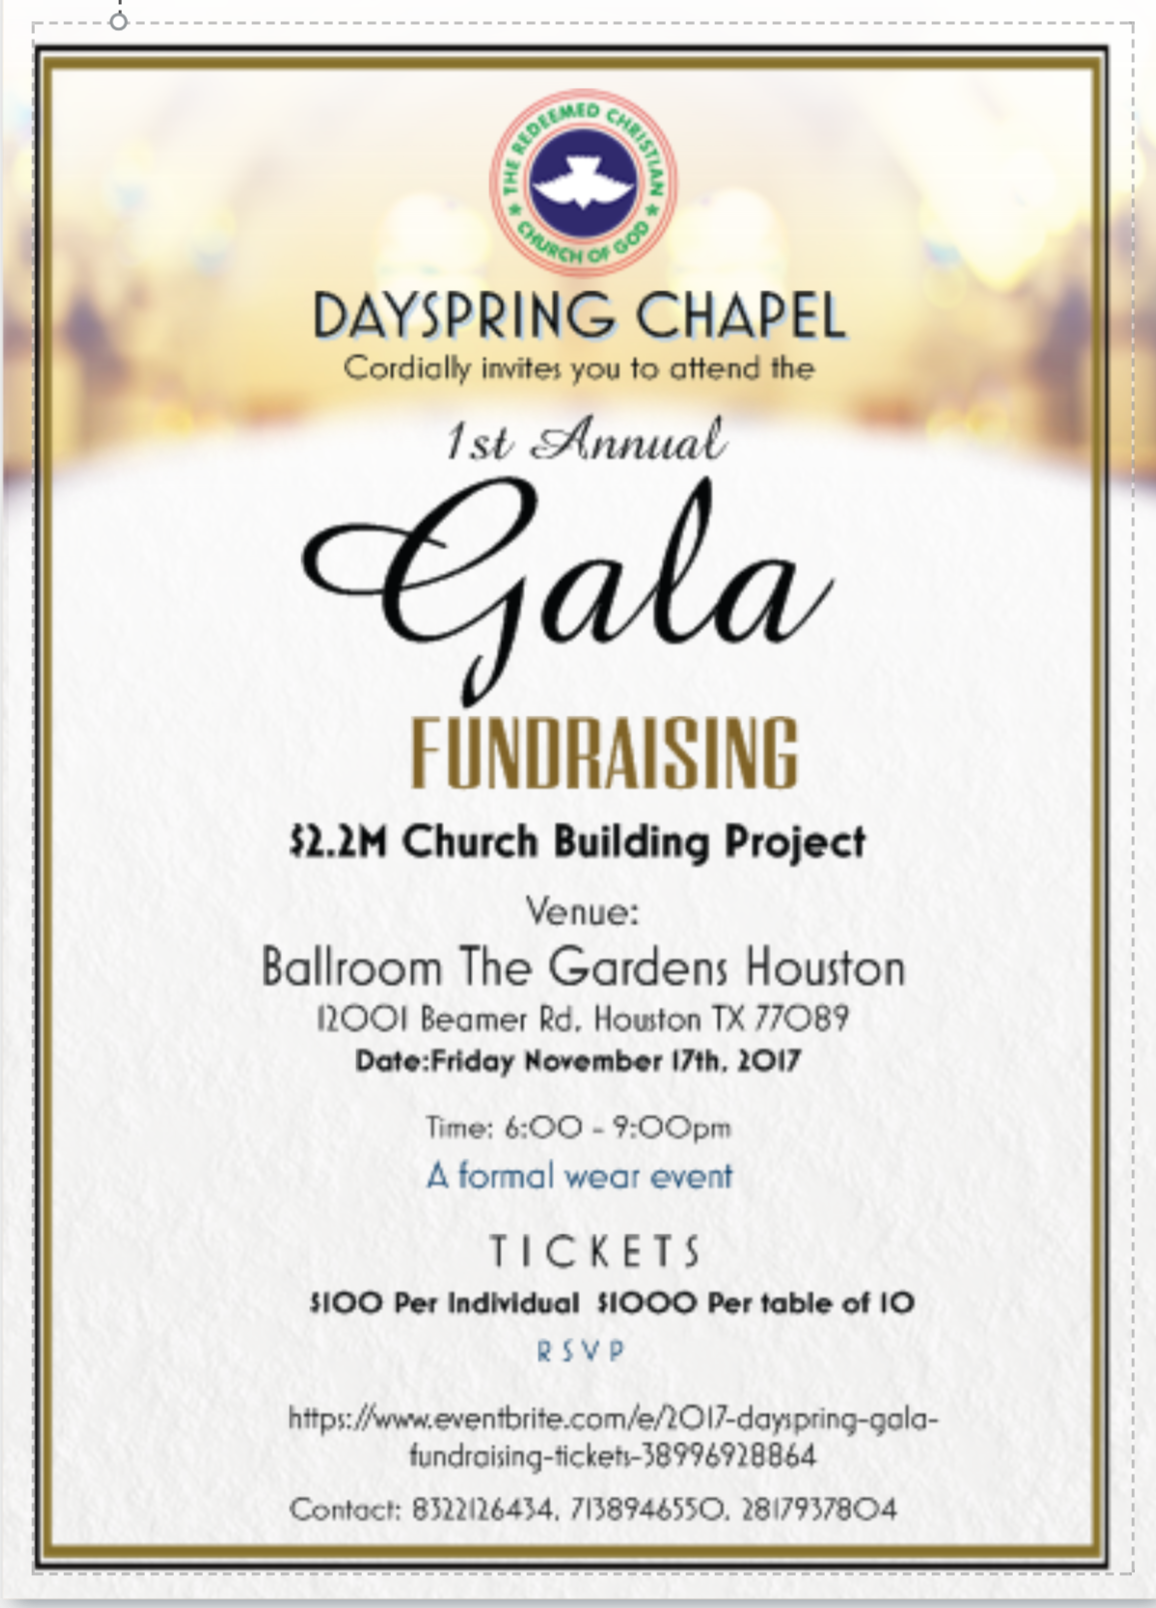 2018 Dayspring Gala Fundraising 16 Mar 2018